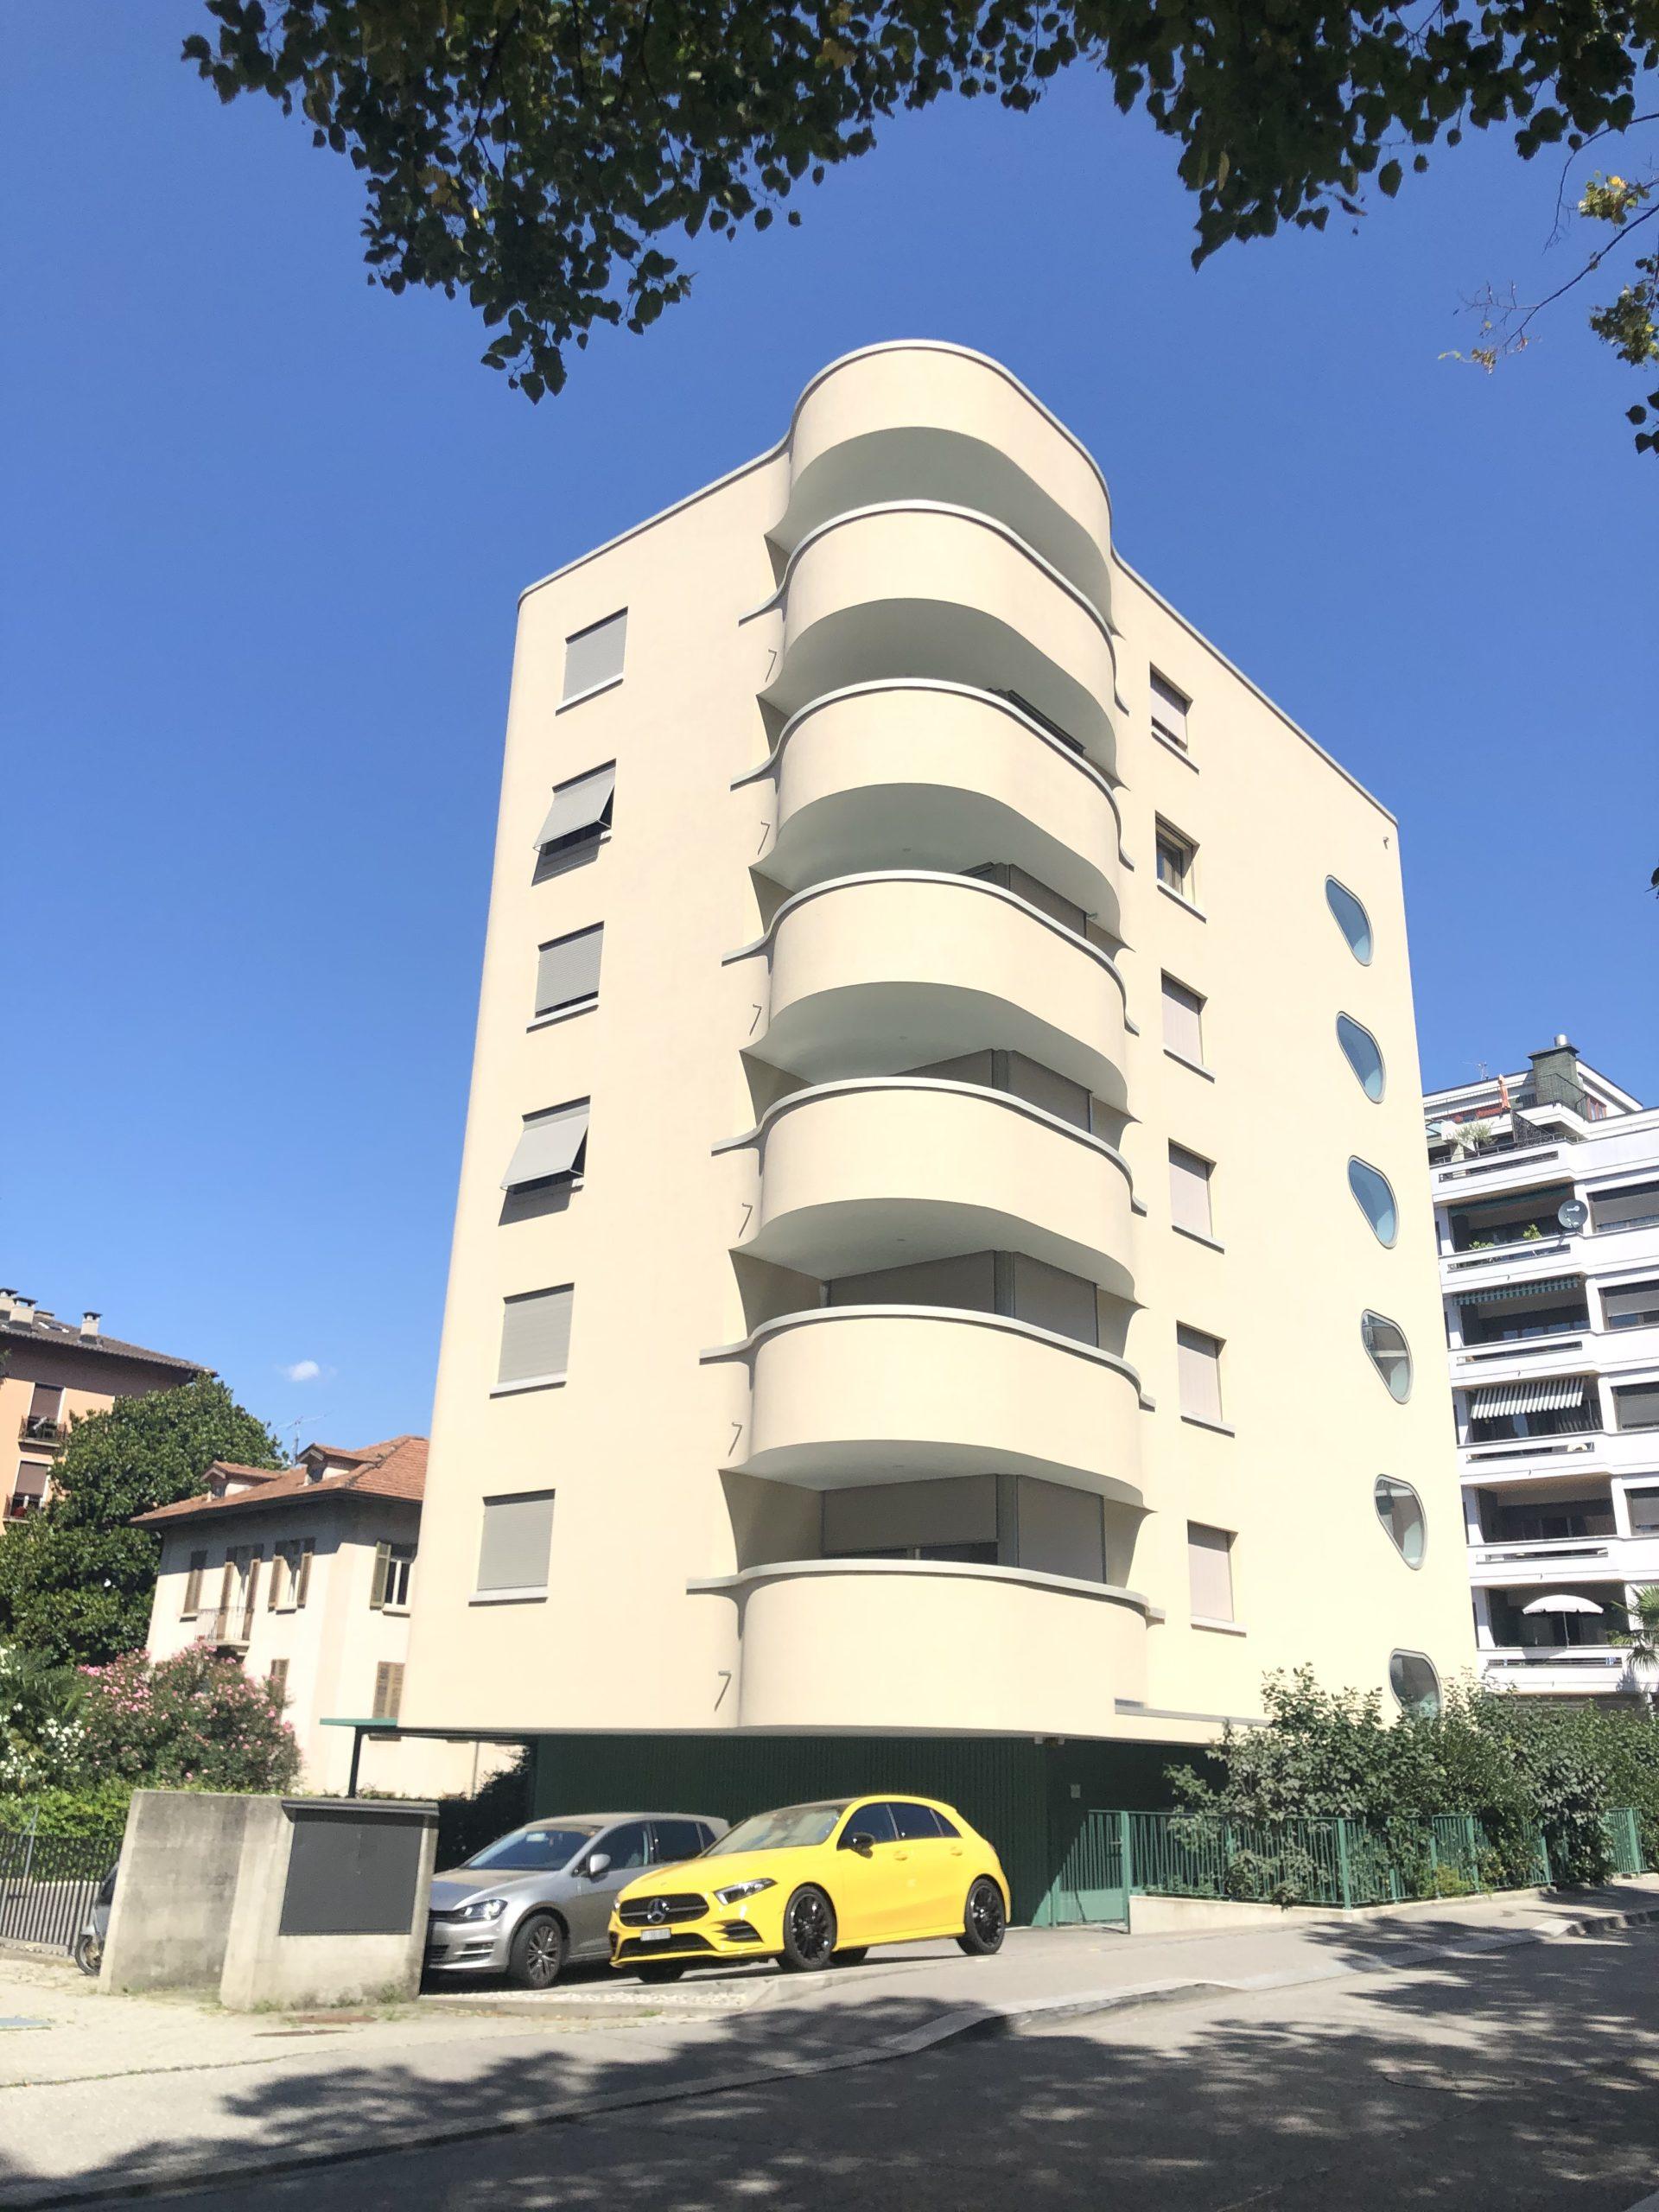 Residenza Girandola, Lugano Cassarate